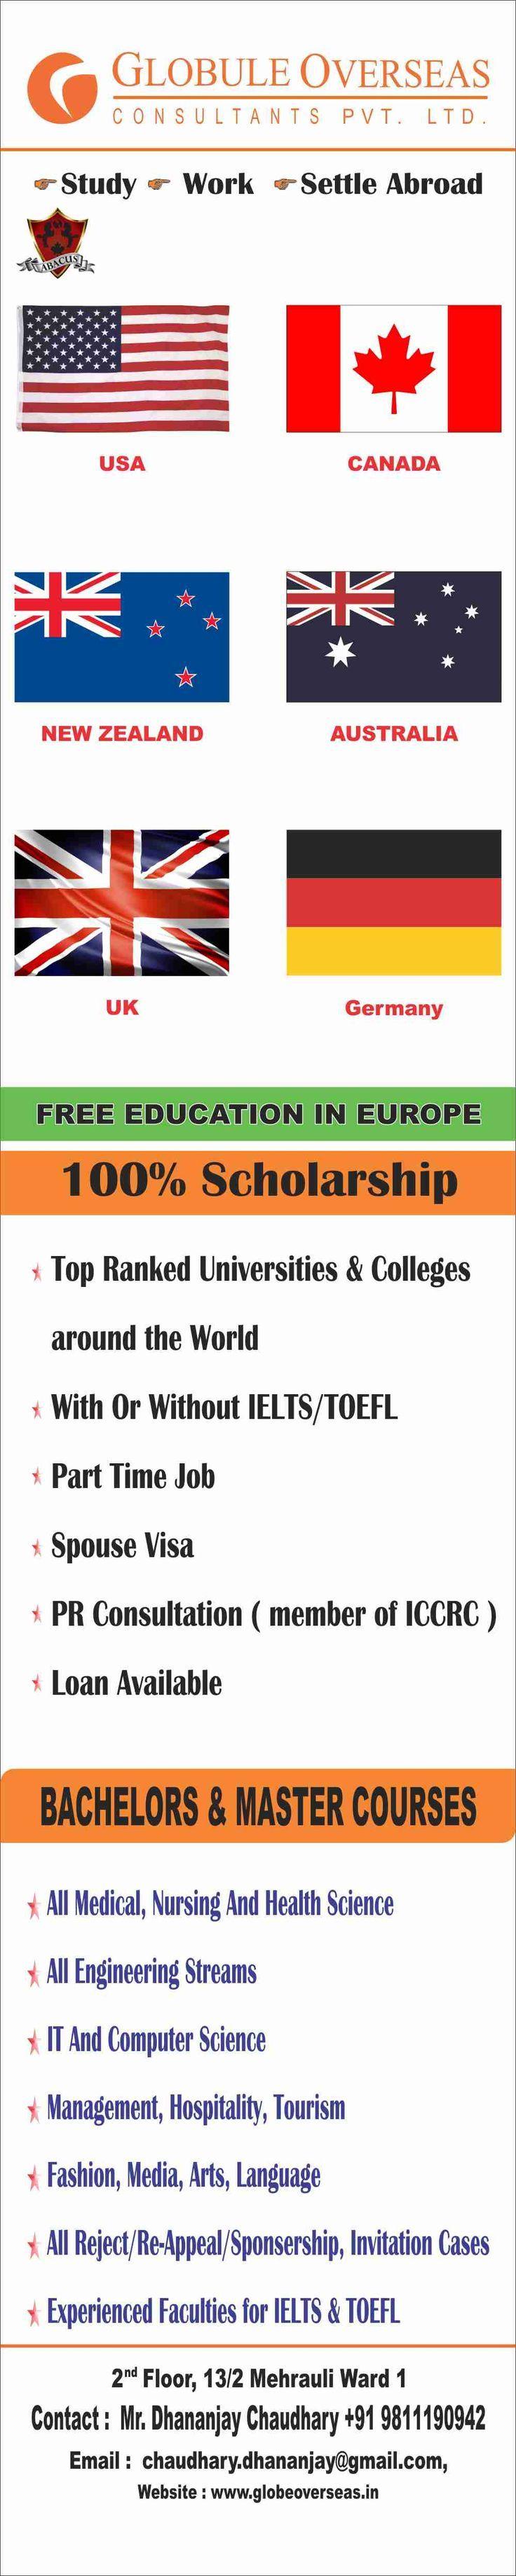 #delhi#newdelhi#instalike #igers #picoftheday #instadaily #instafollow #followme#instagood #instacool#instago#globule#overseas#globuleoverseas#education#consultant#study#abroad#learning#college#university#globeoverseas#freeeducation#free#education#scholarship##internationaleducation#www.globeoverseas.in#studyabroad#summer2016#collegelife#school#teacher#studyandsettle#instaeducation#internationaleducation#usa#uk#europe#ielts#noielts#toefl#australia#newzealand#visa#mba#student#graduation